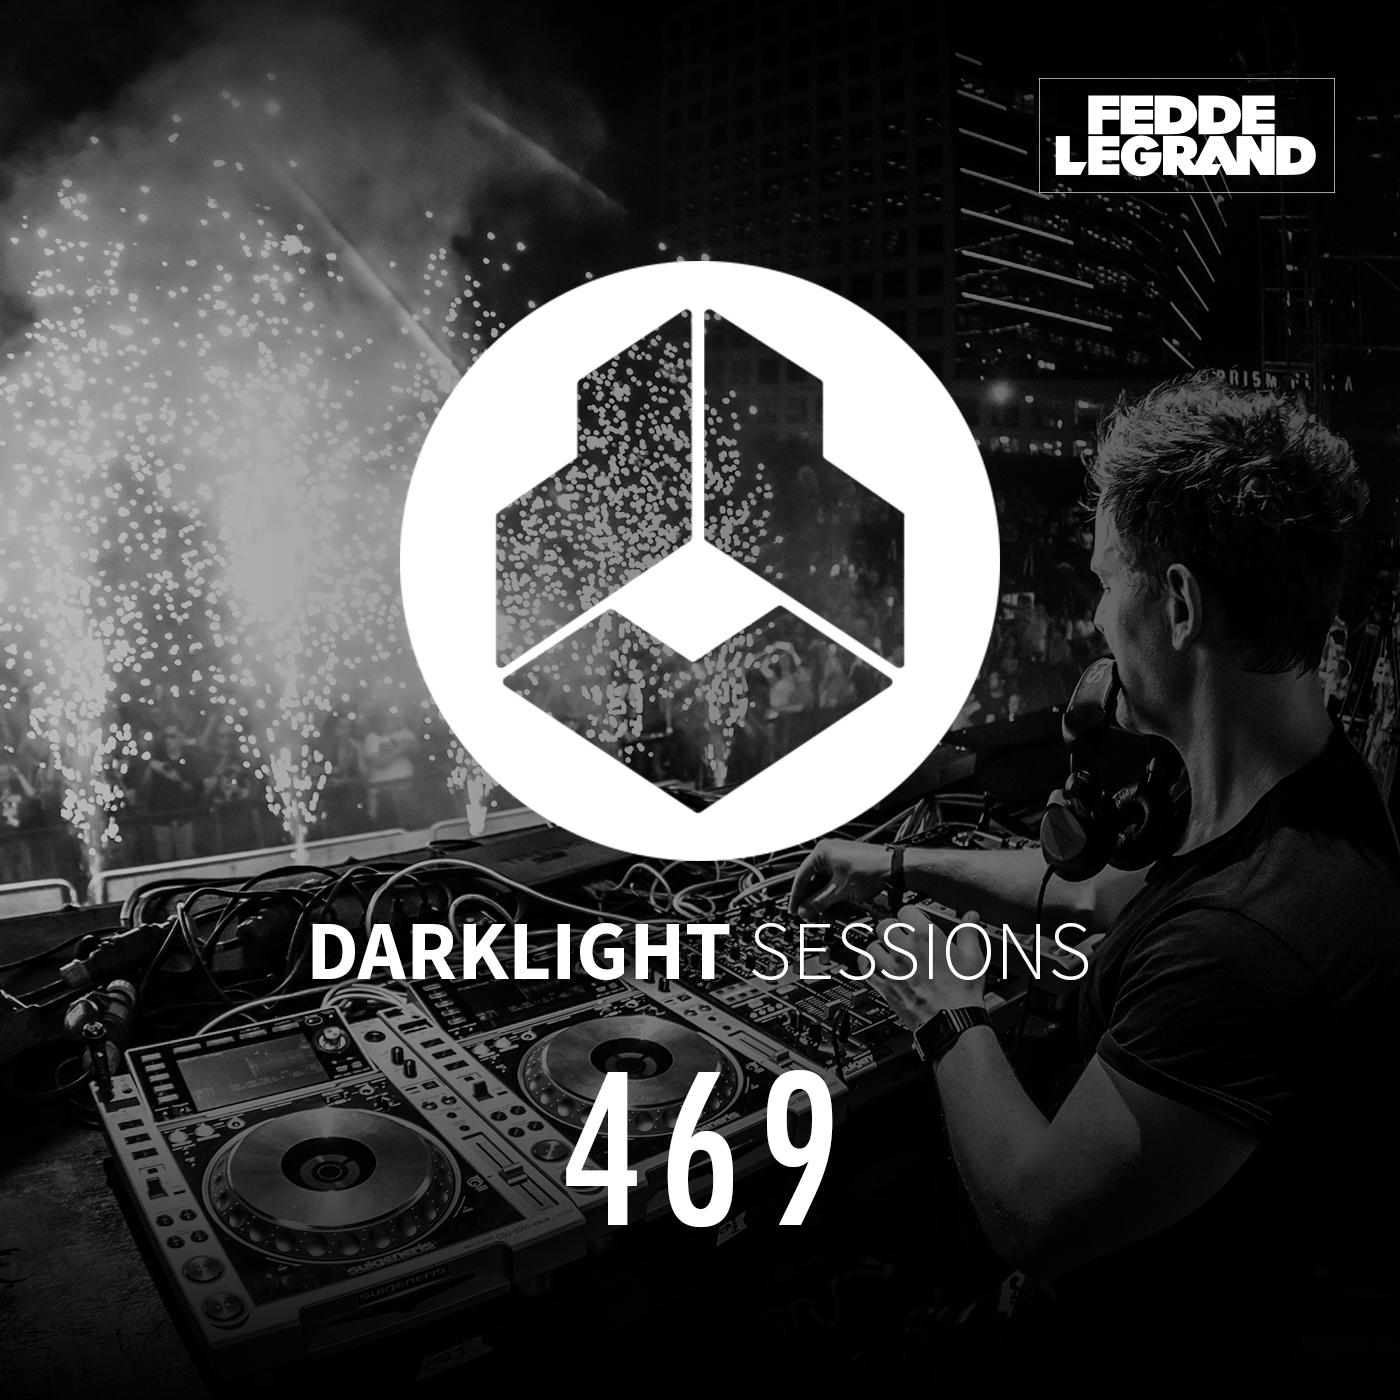 Darklight Sessions 469